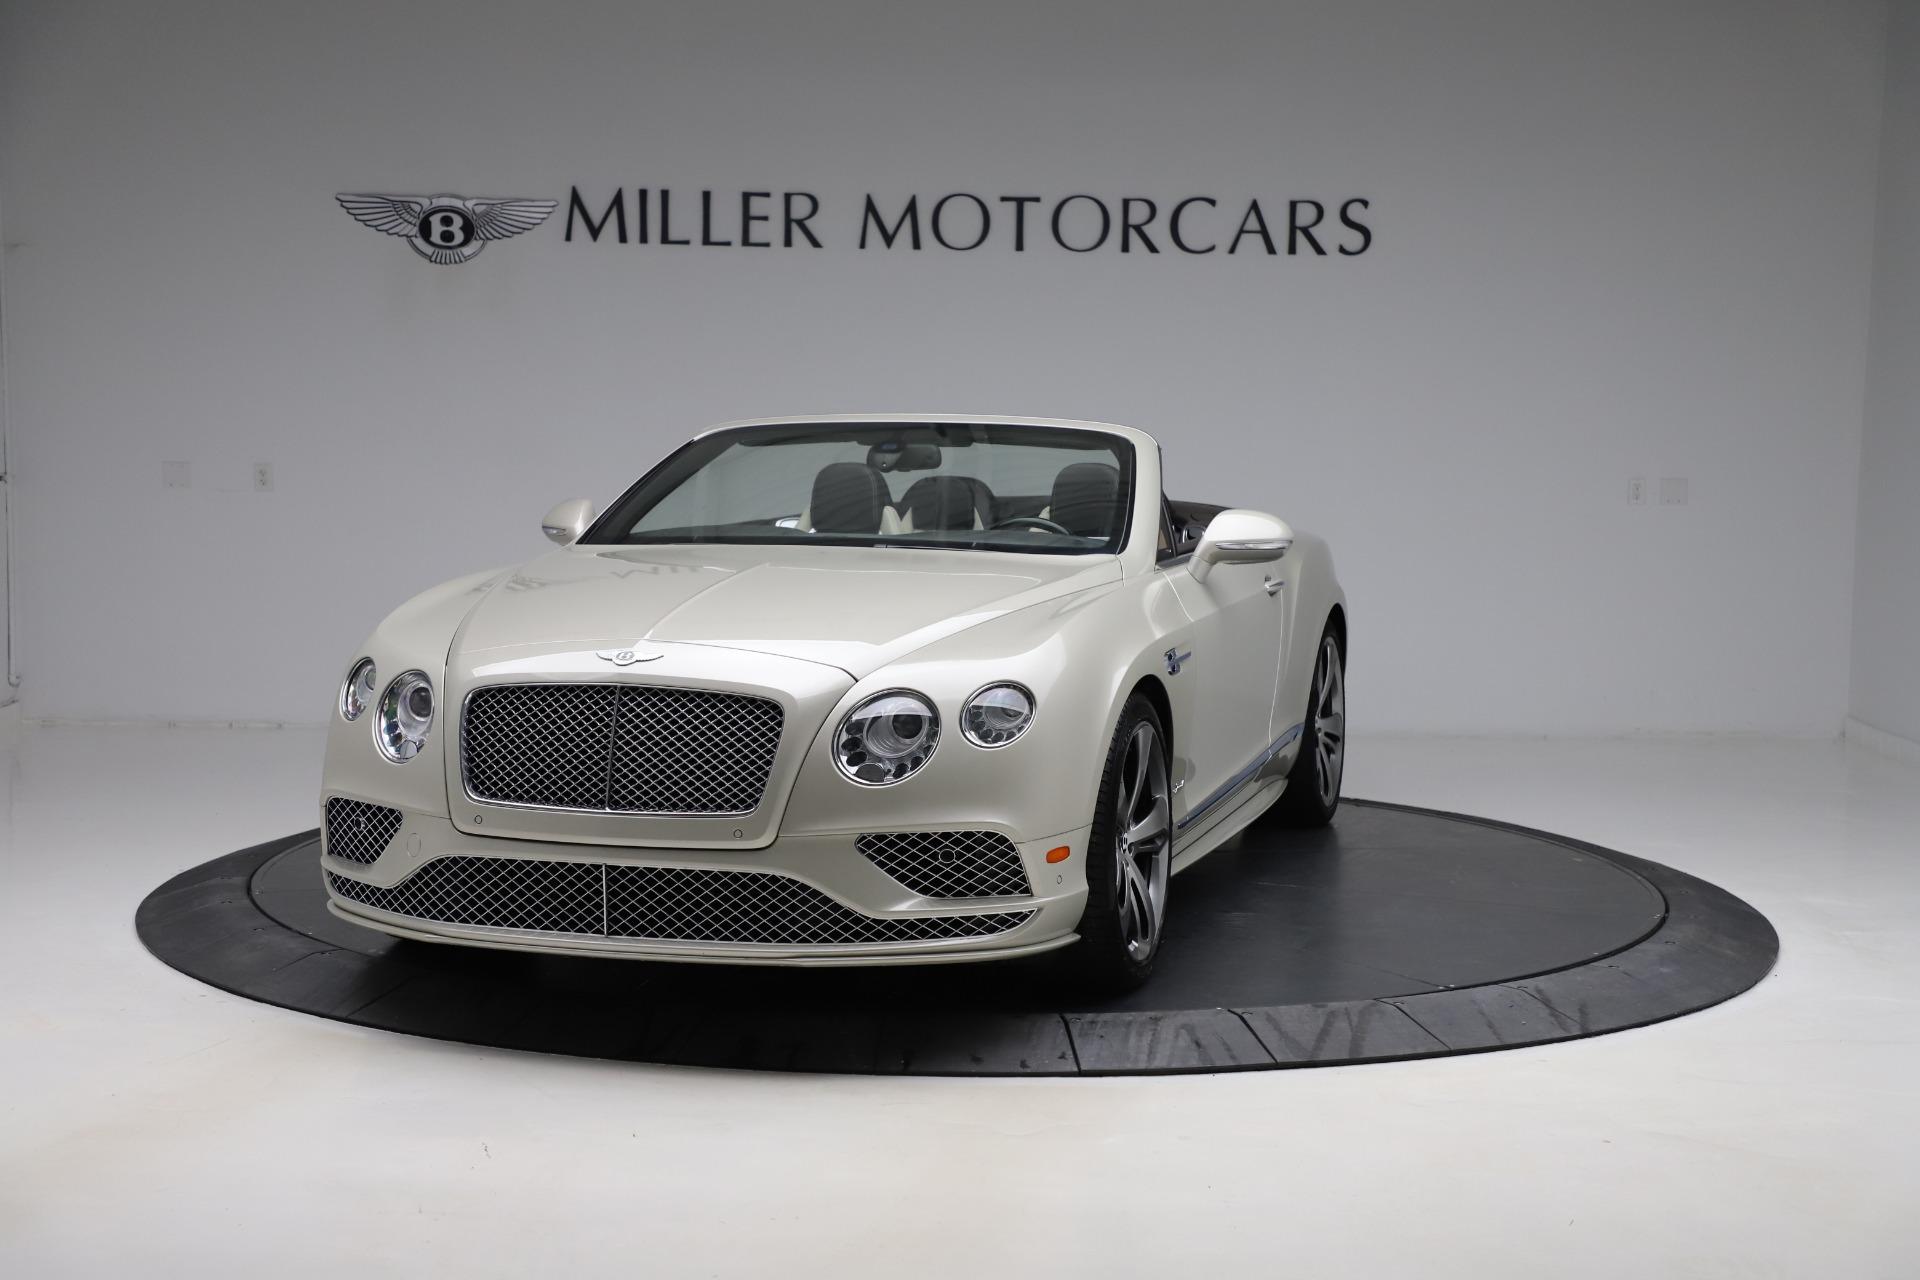 Used 2016 Bentley Continental GTC Speed for sale Sold at Alfa Romeo of Westport in Westport CT 06880 1